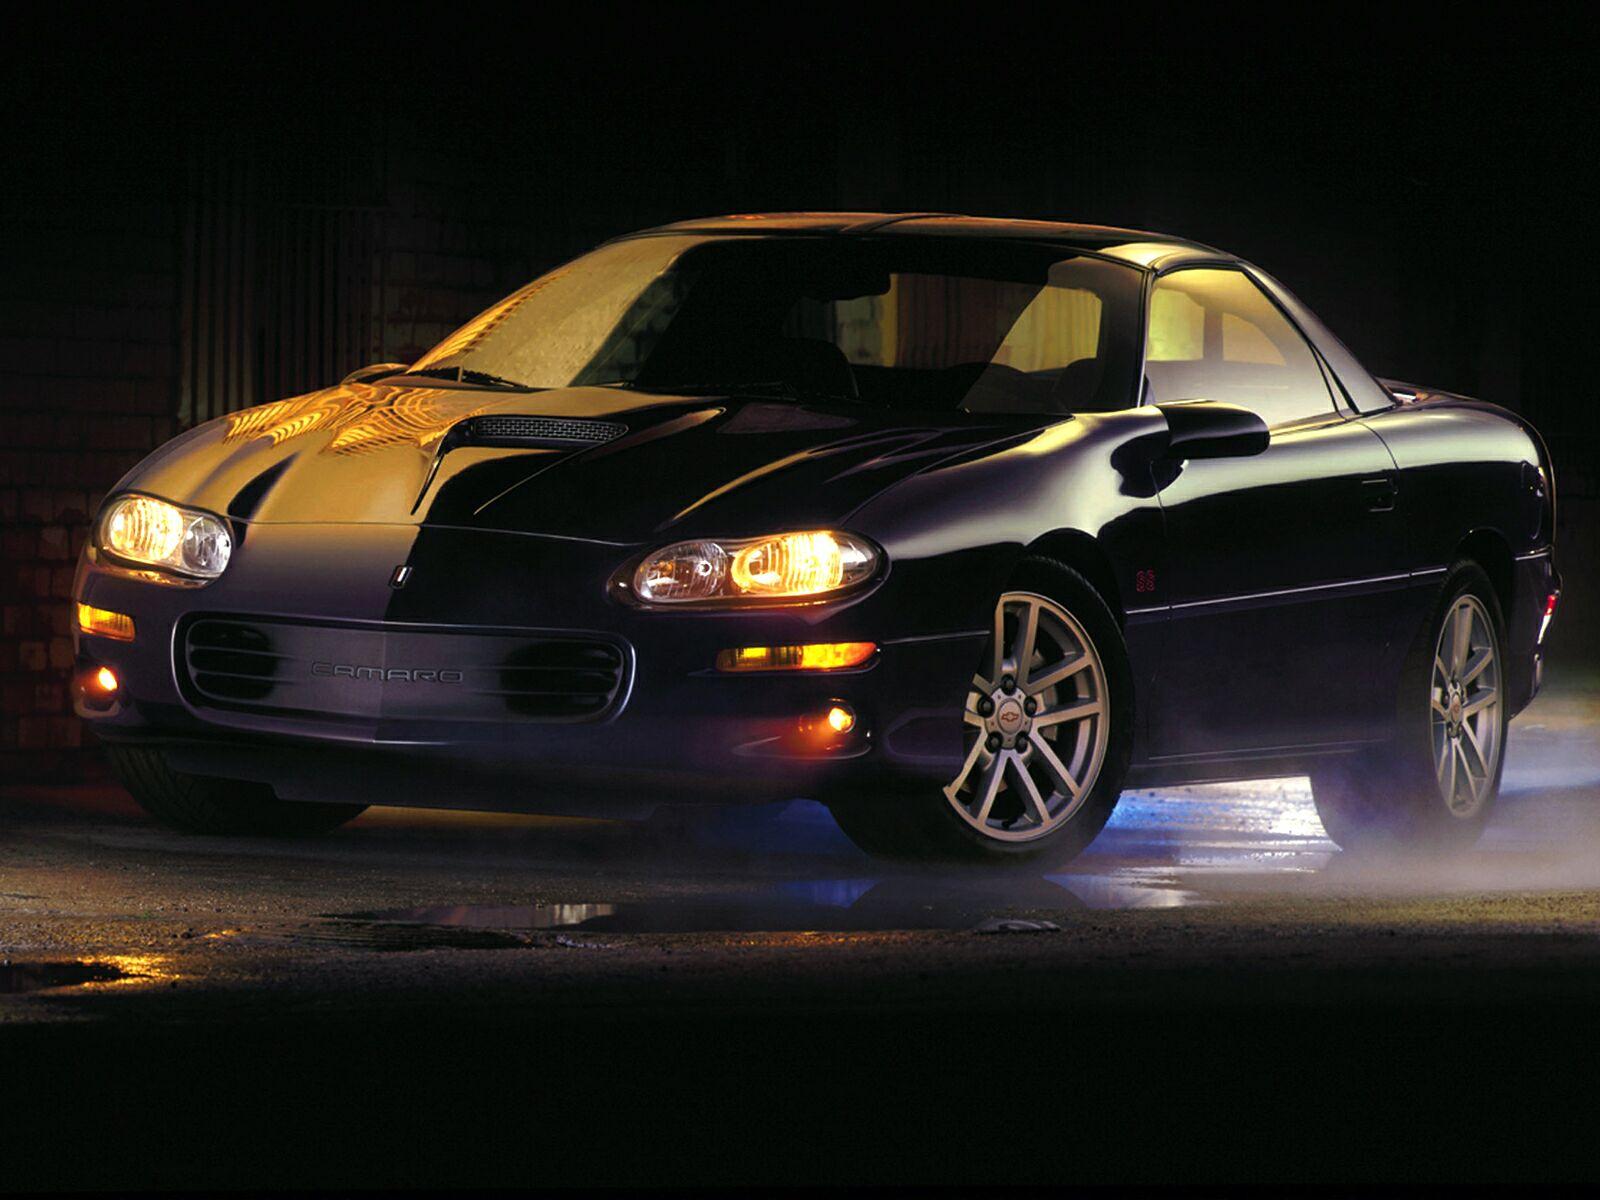 http://4.bp.blogspot.com/-qRbInit5DKo/T3S9SkBDXKI/AAAAAAAAAqg/MA31QyOObFY/s1600/Chevrolet_Camaro%252C_2001.jpg